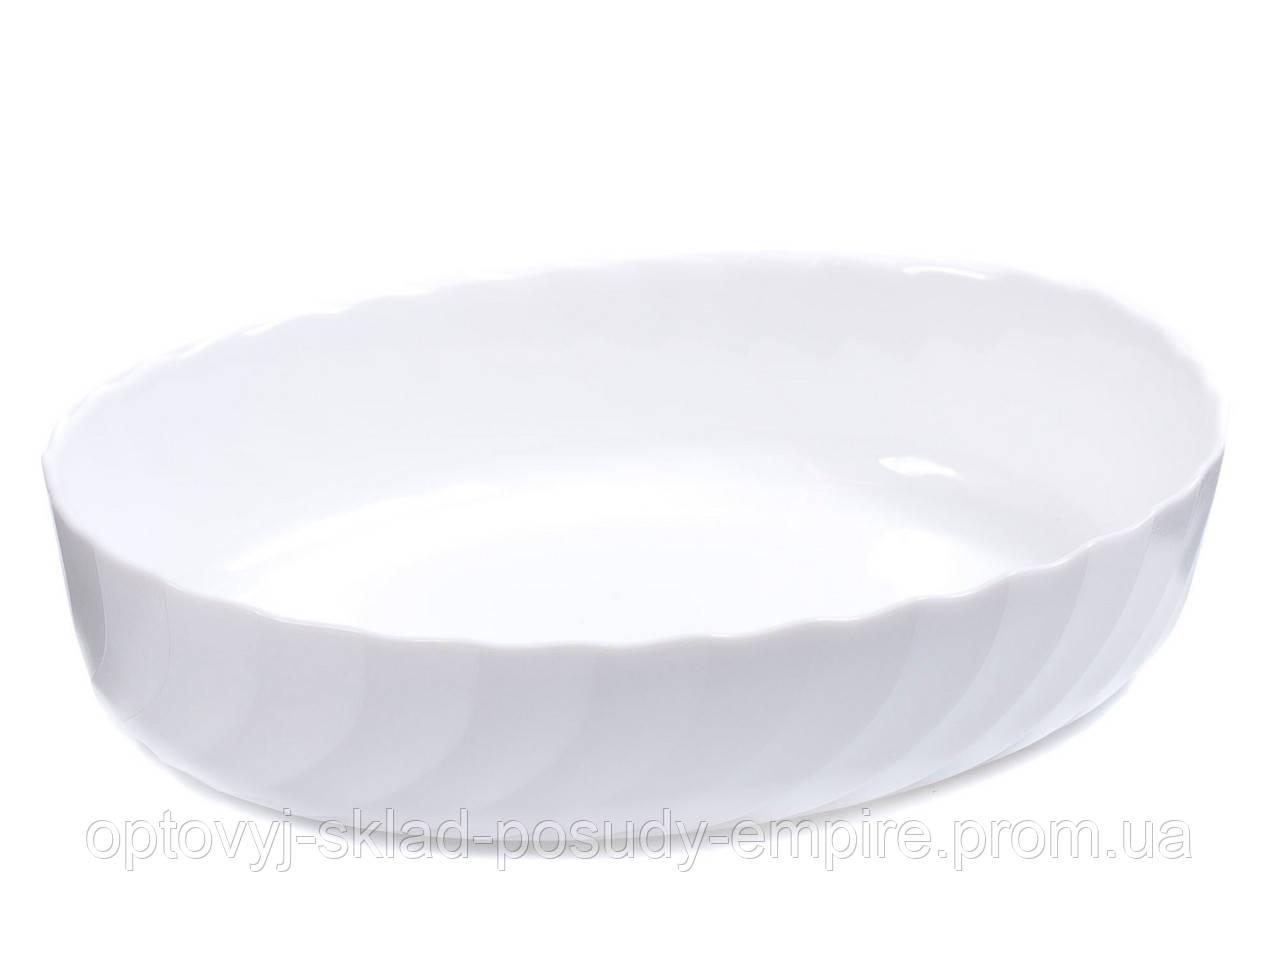 Блюдо глубокое для запекания 32х24см Luminarc Trianon P4018